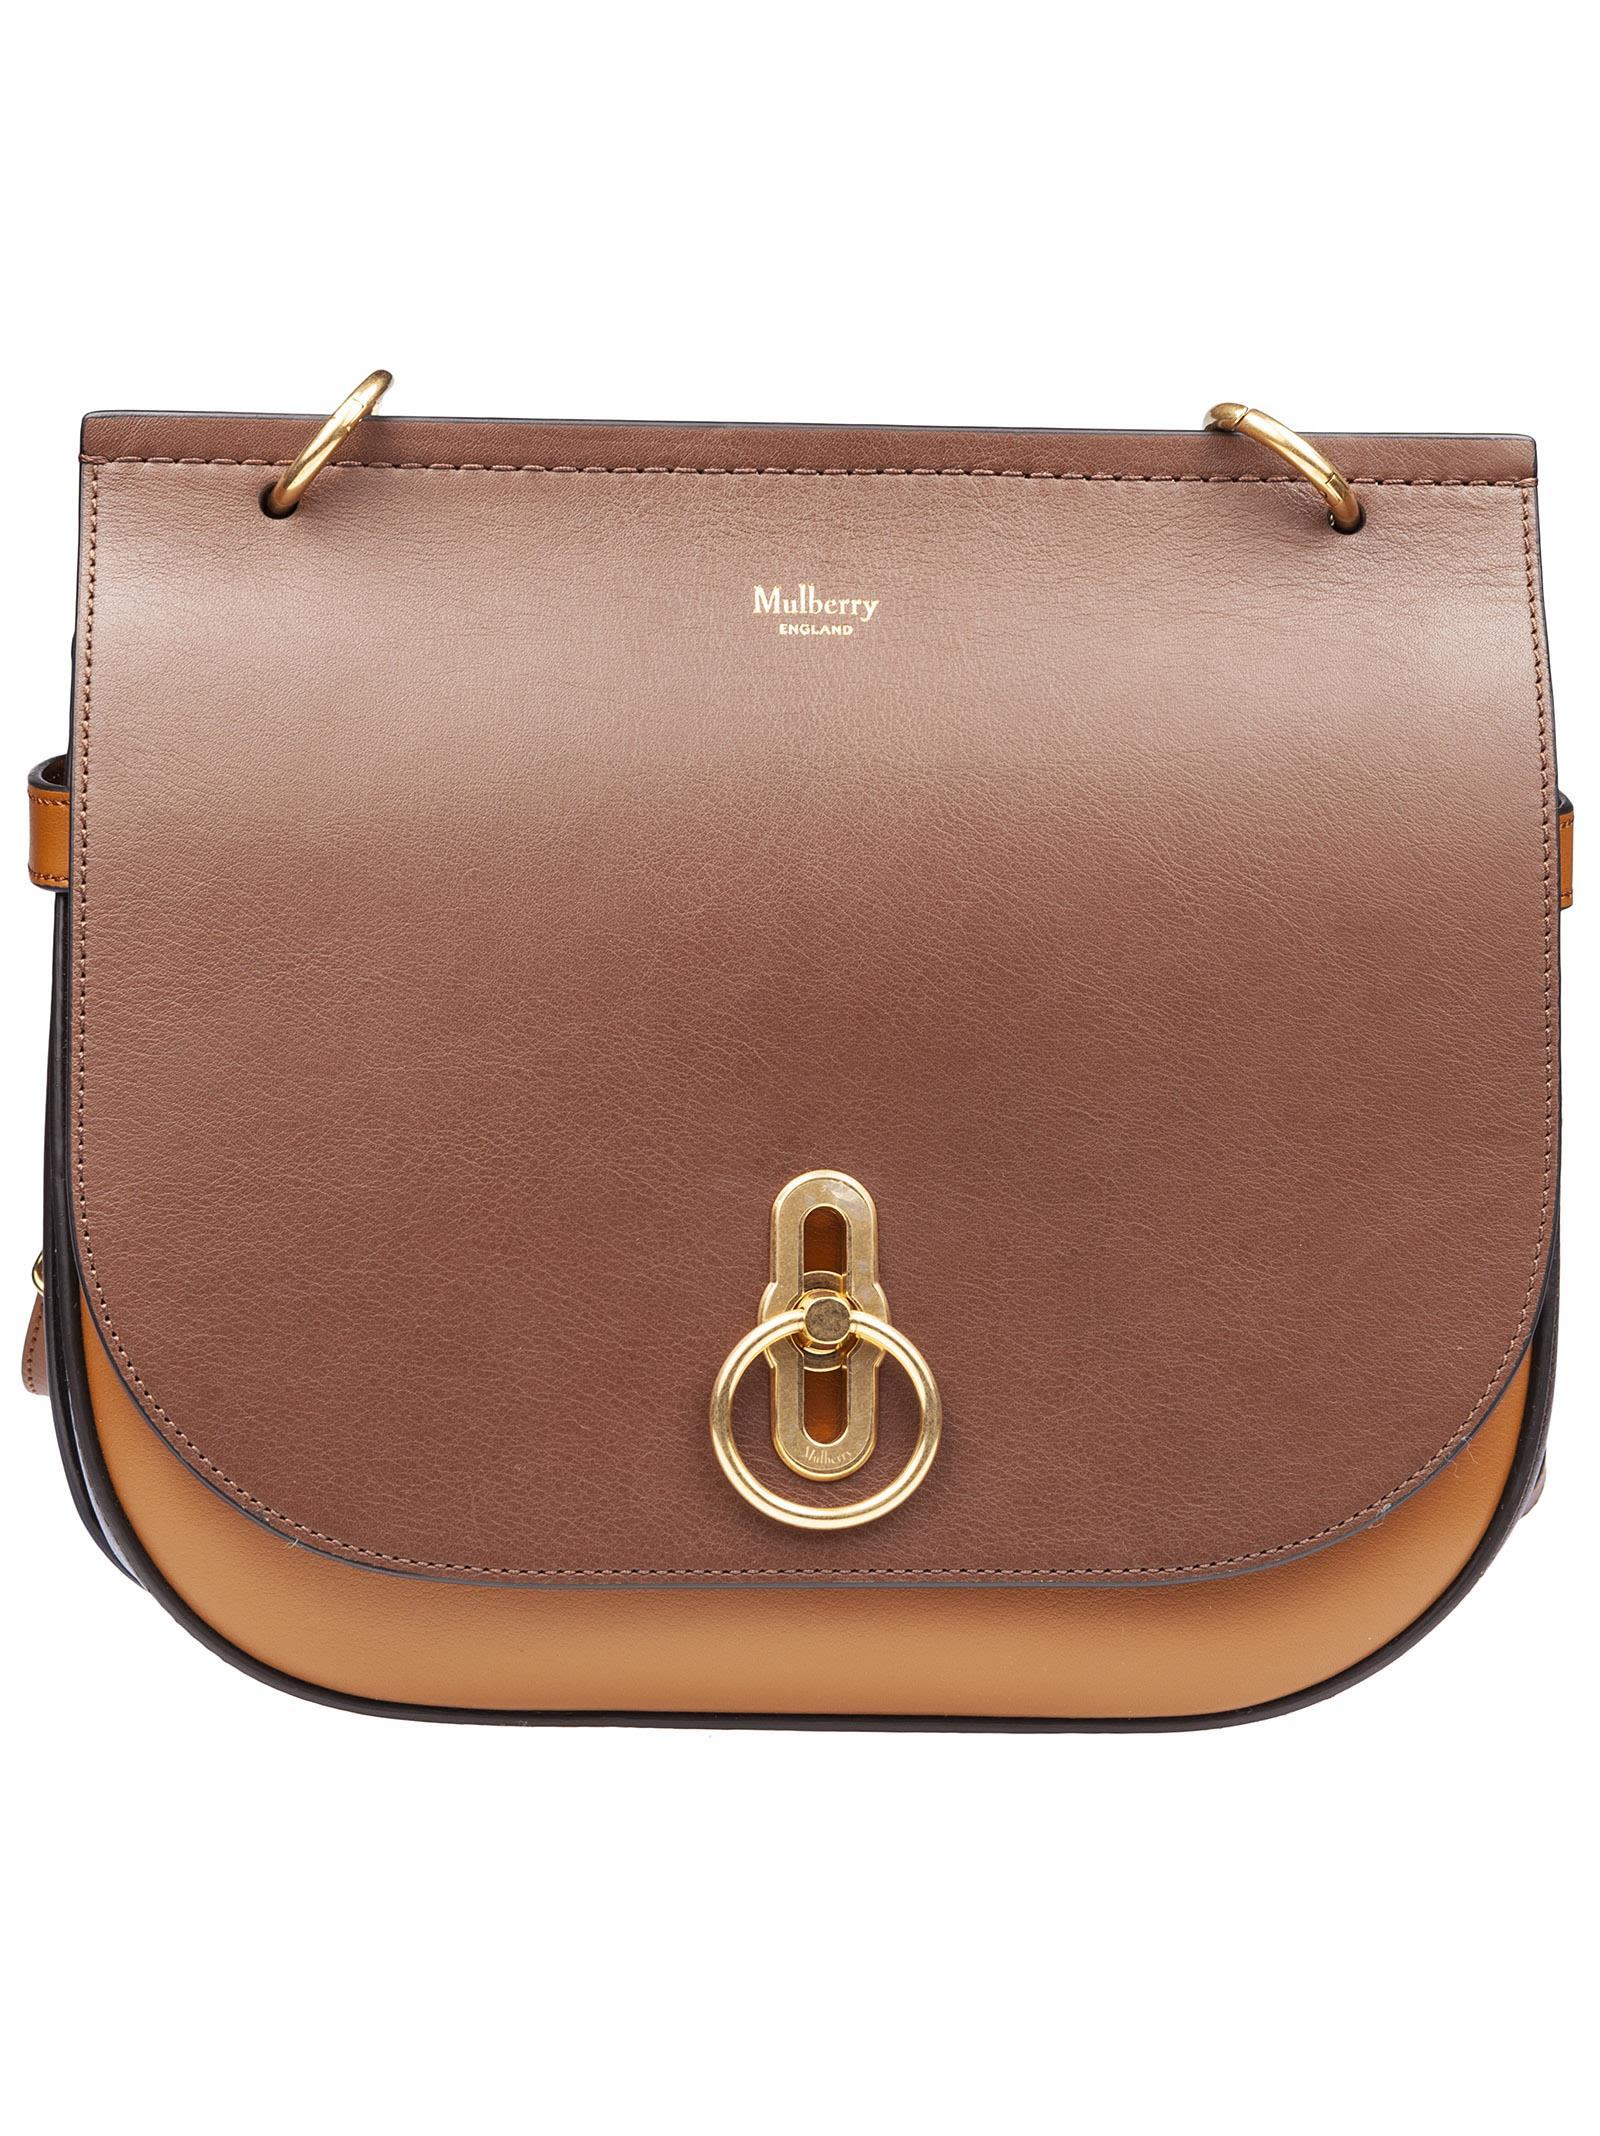 Amberley Shoulder Bag in Tobacco/Cedar/Chocolate